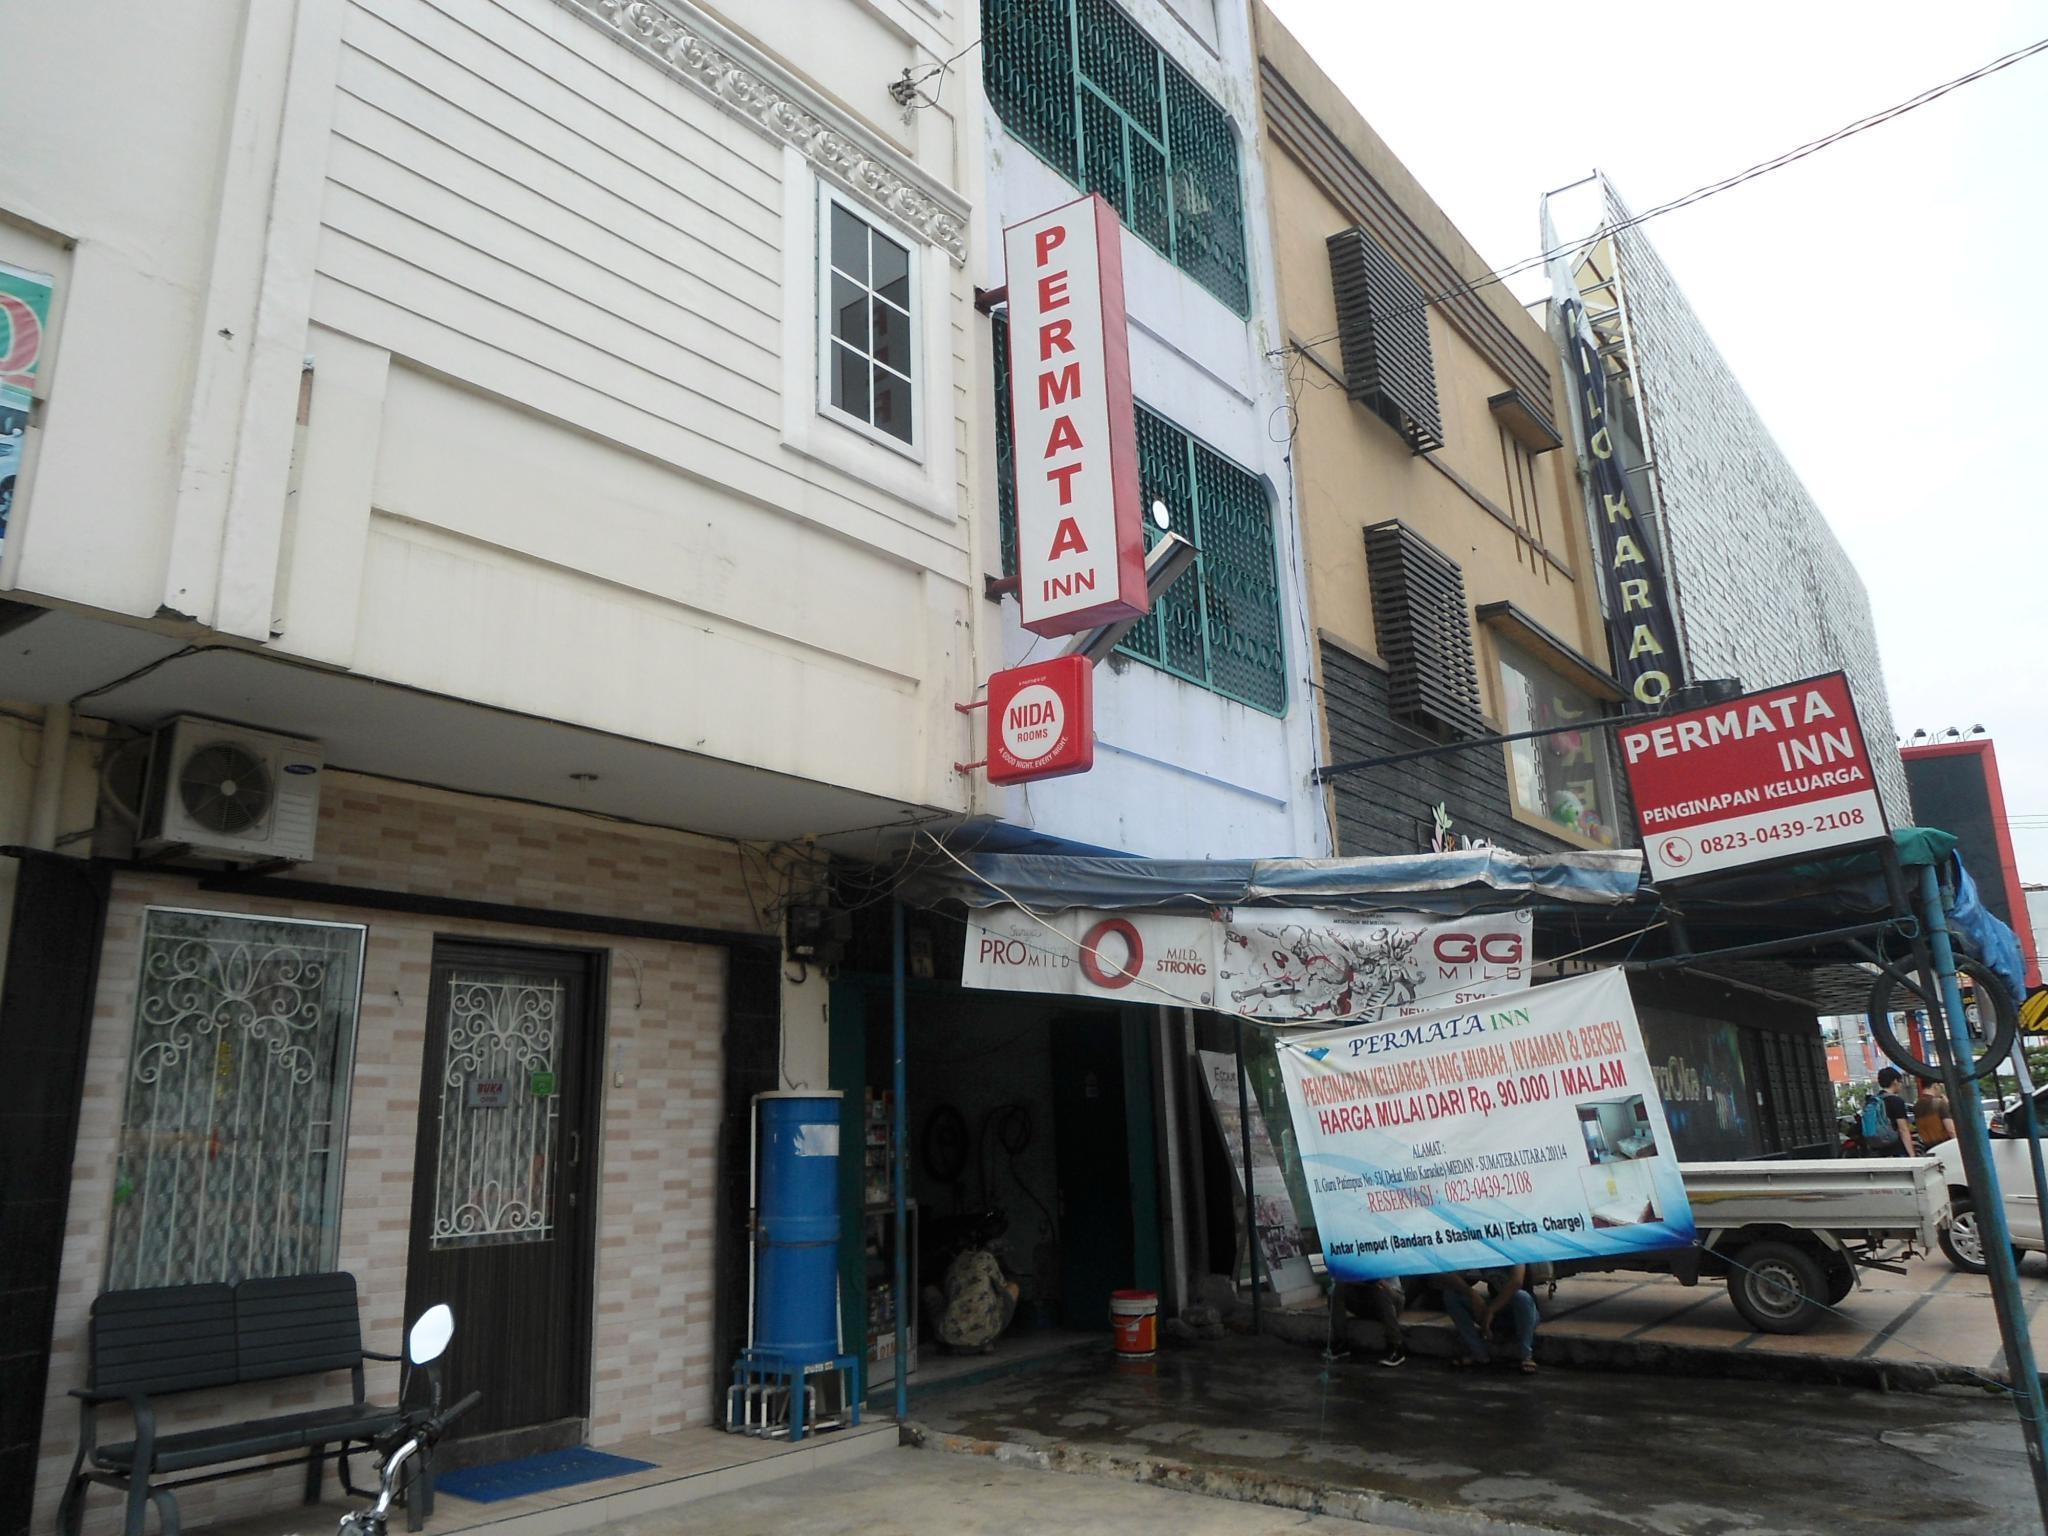 Permata Inn